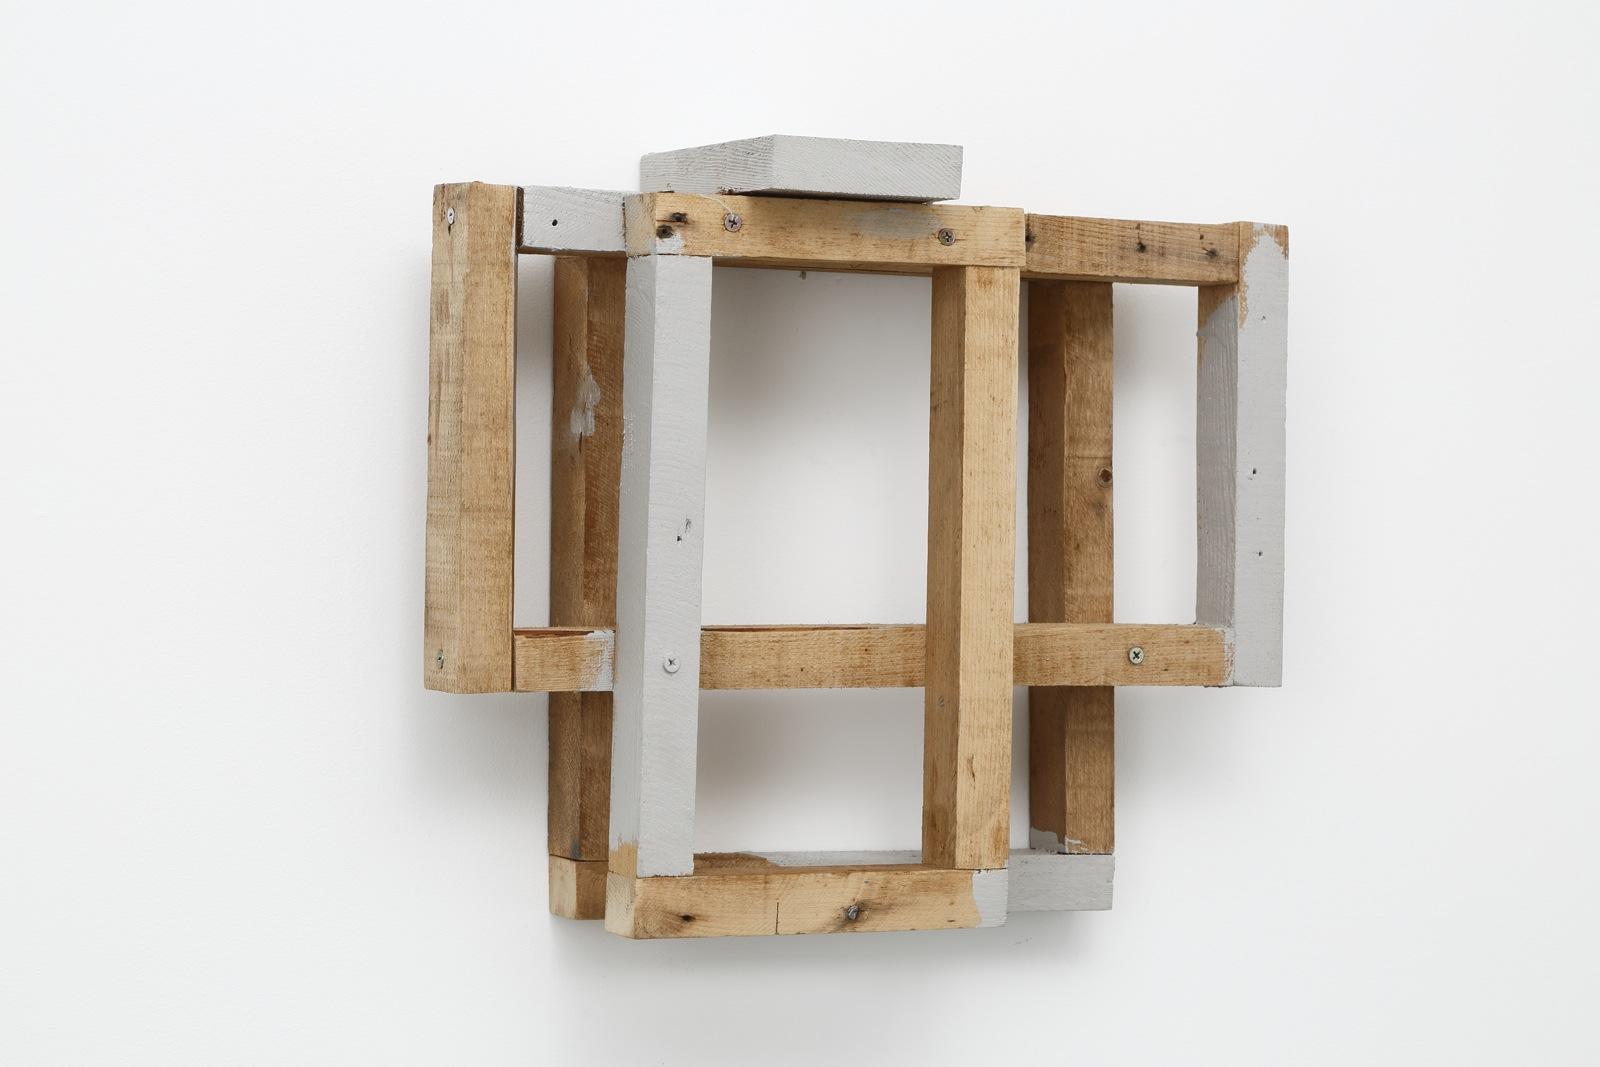 Accumulated Surroundings , 1989 周囲集 ( Shūishū ) Wood, gray paint 15 x 17 15/16 x 5 7/8 inches 38 x 45.5 x 15 centimeters